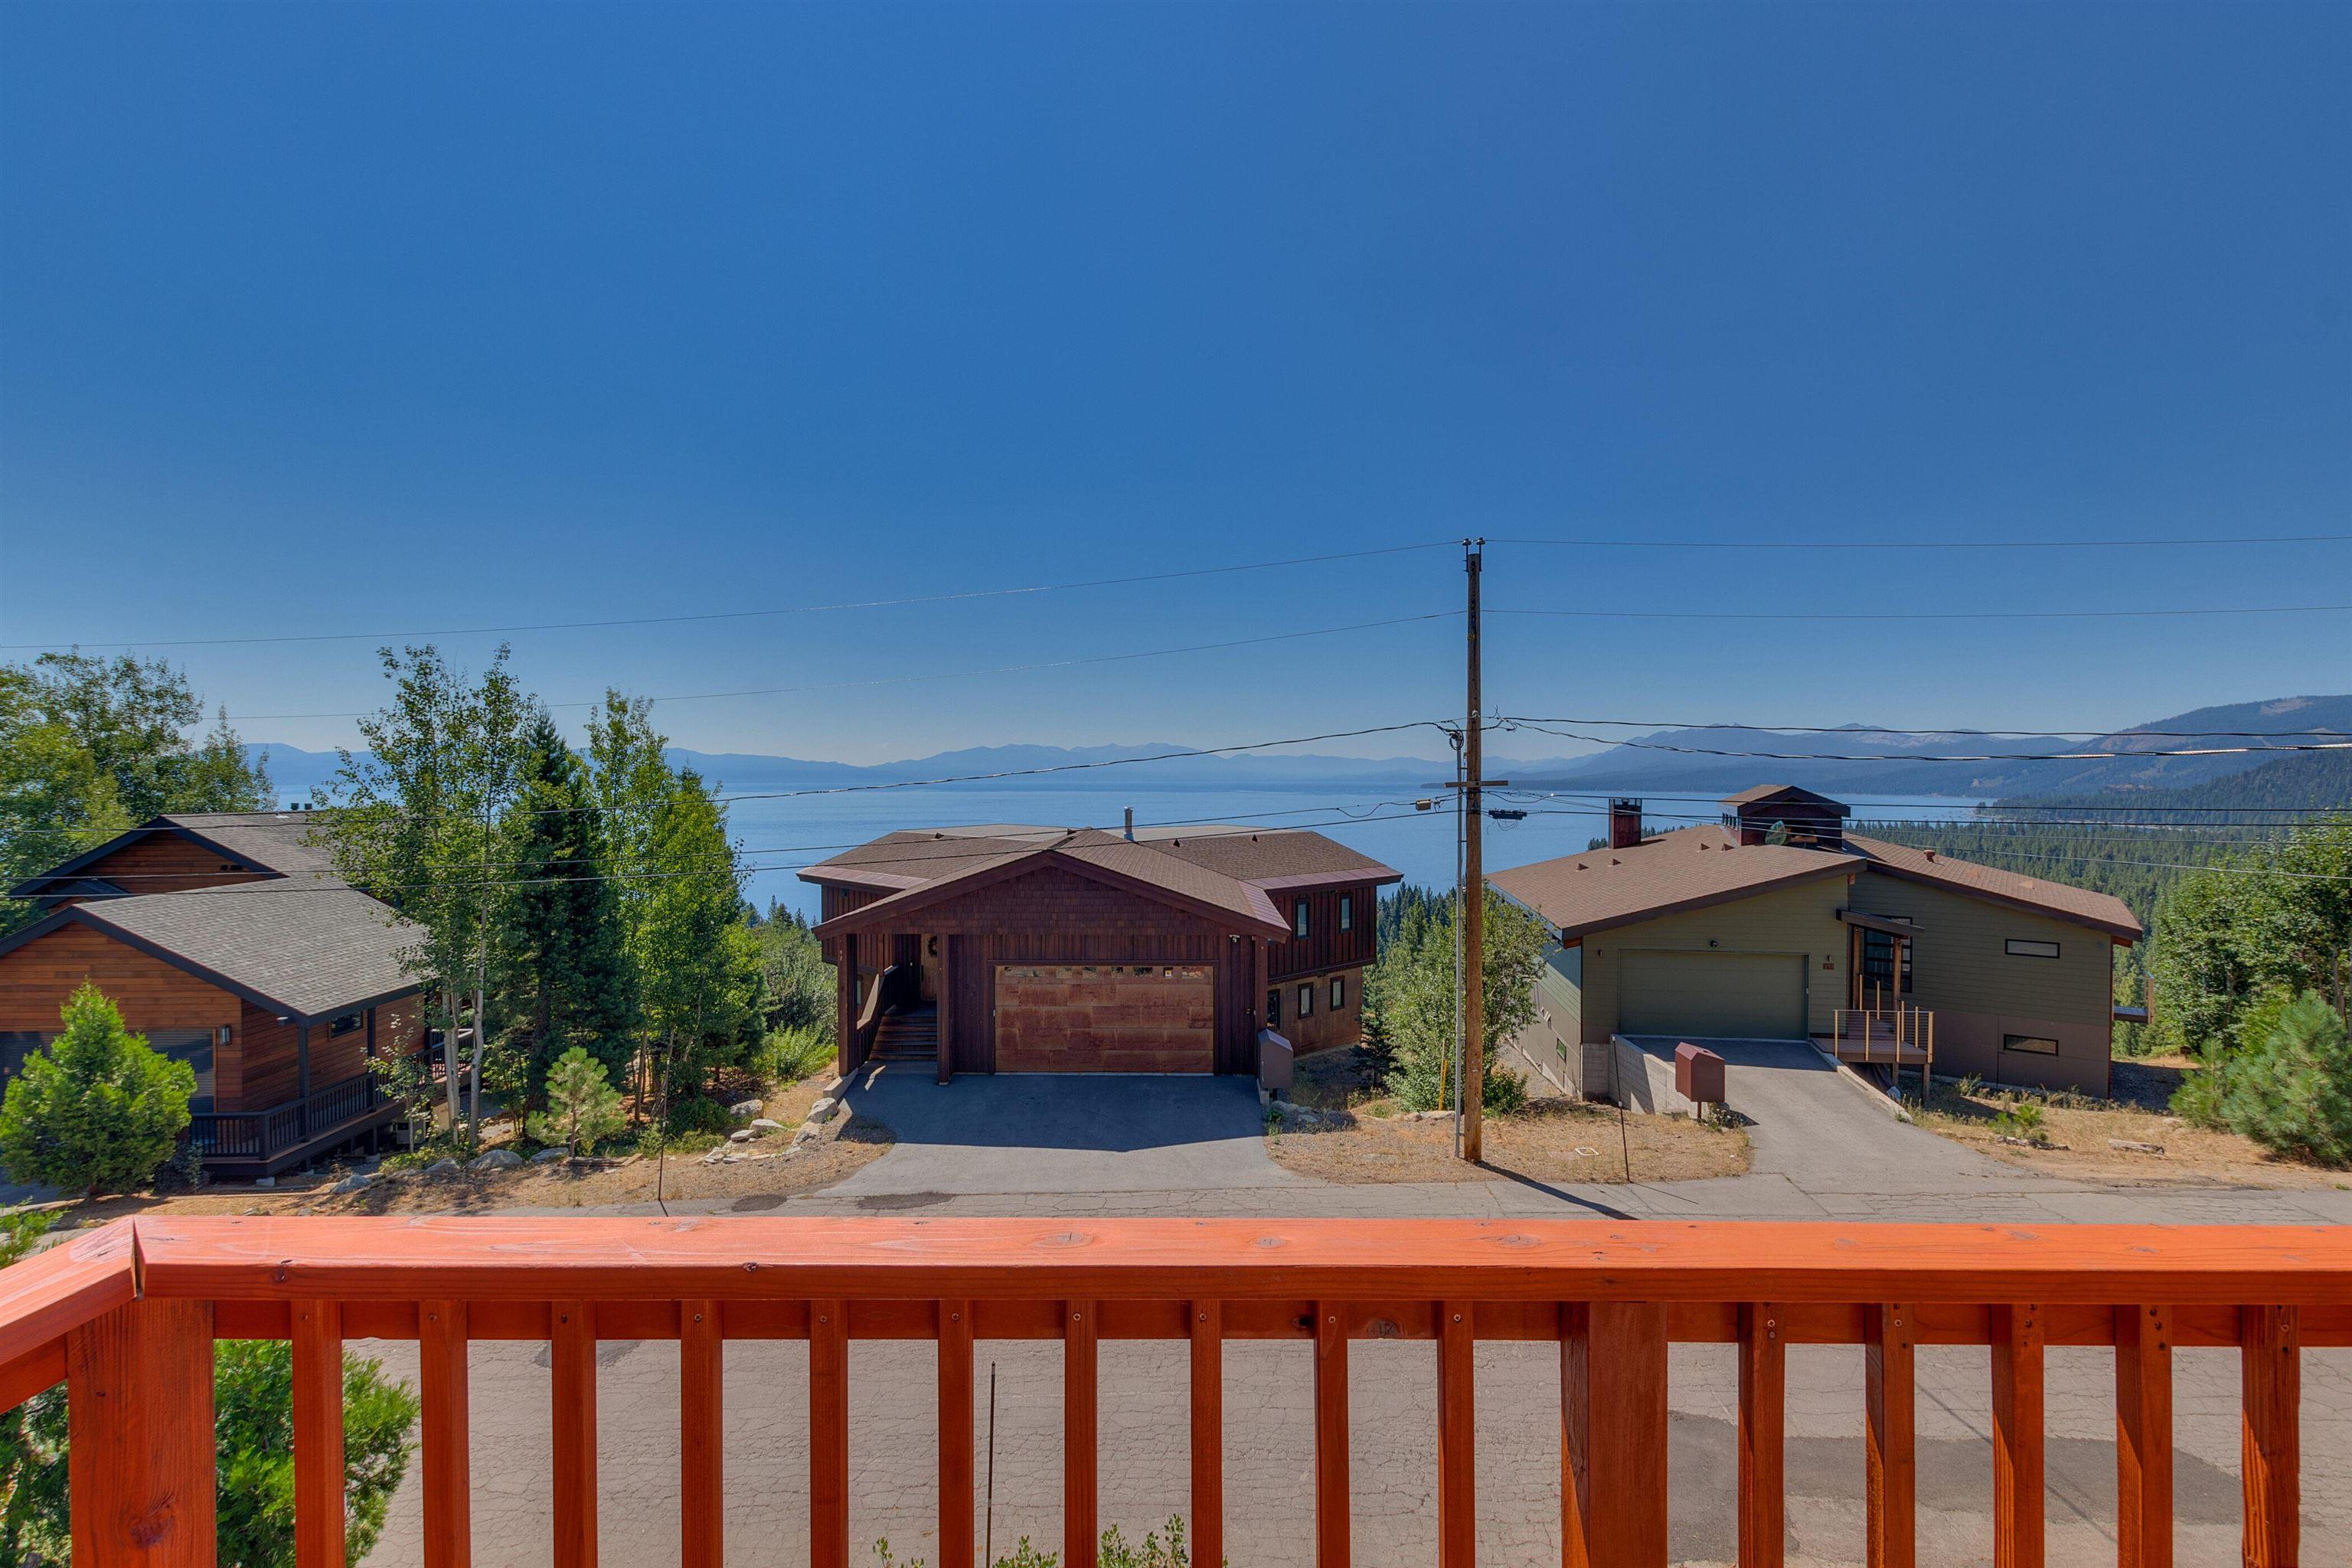 Image for 272 Tahoe Woods Blvd, Tahoe City, CA 96145